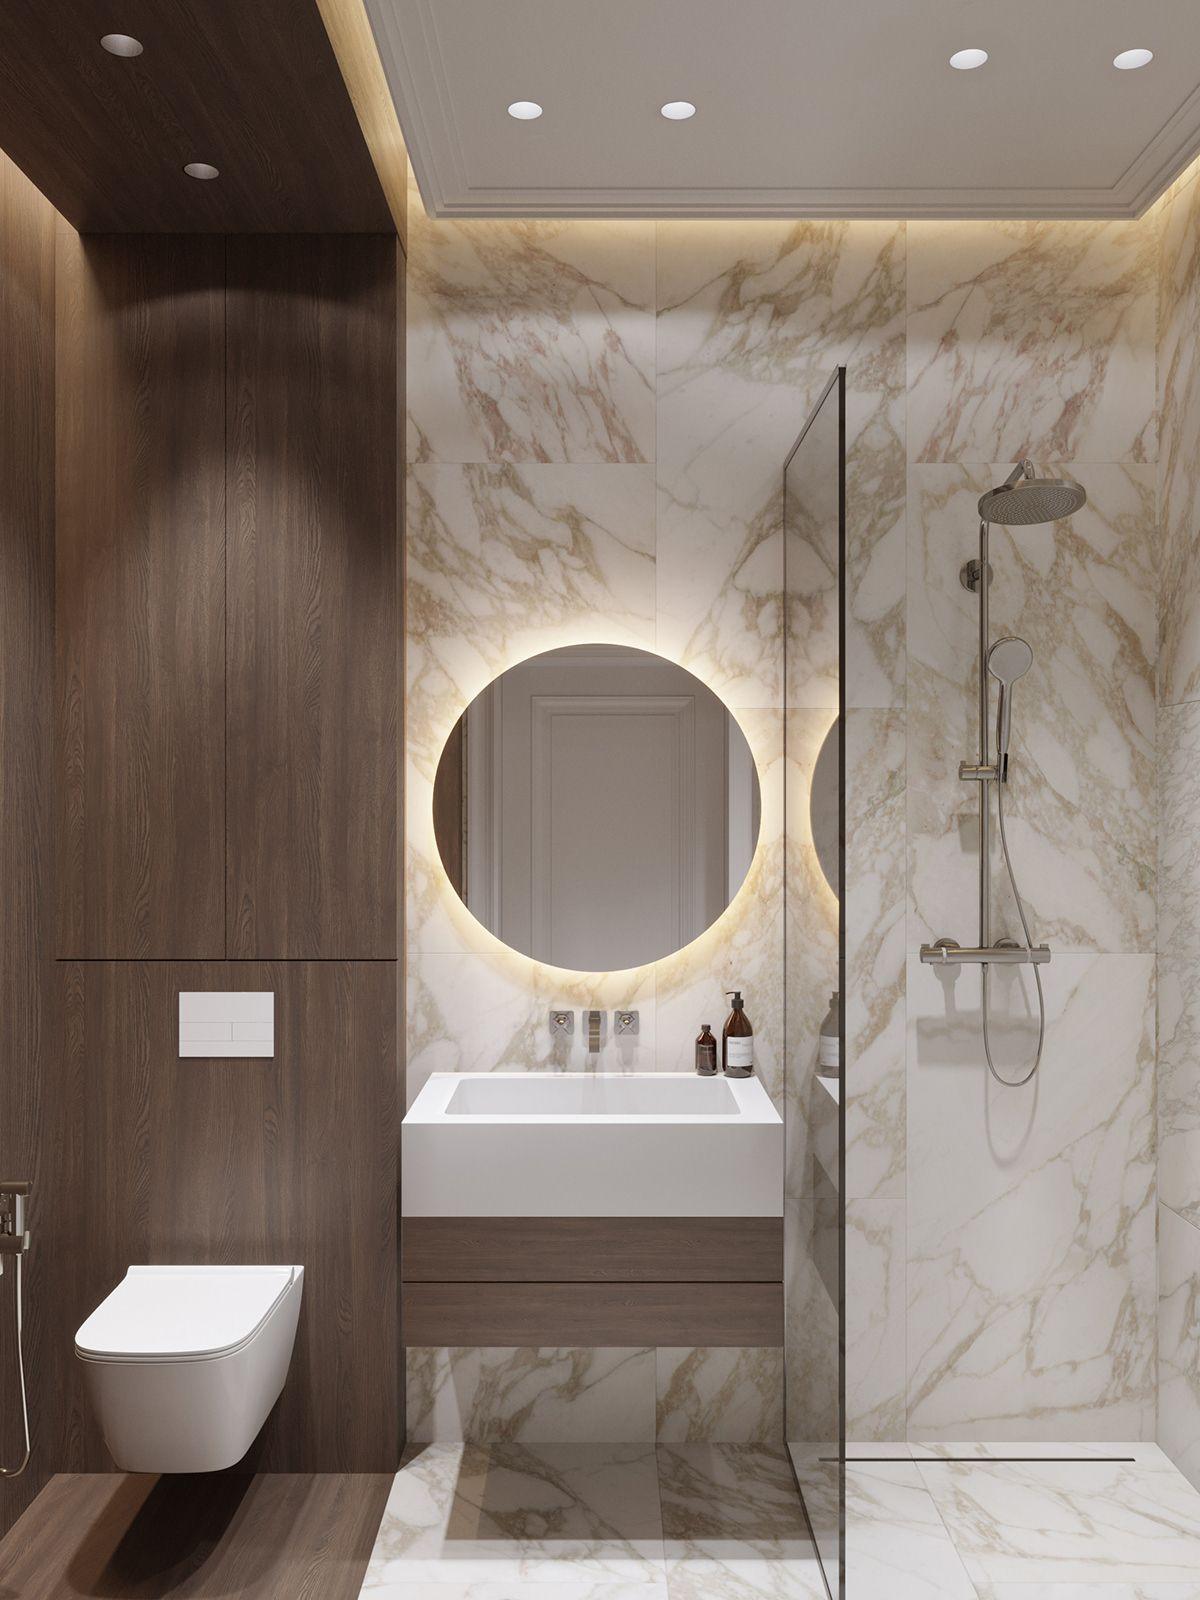 Rublevka Project On Behance Minimalist Bathroom Design Washroom Design Popular Bathroom Designs